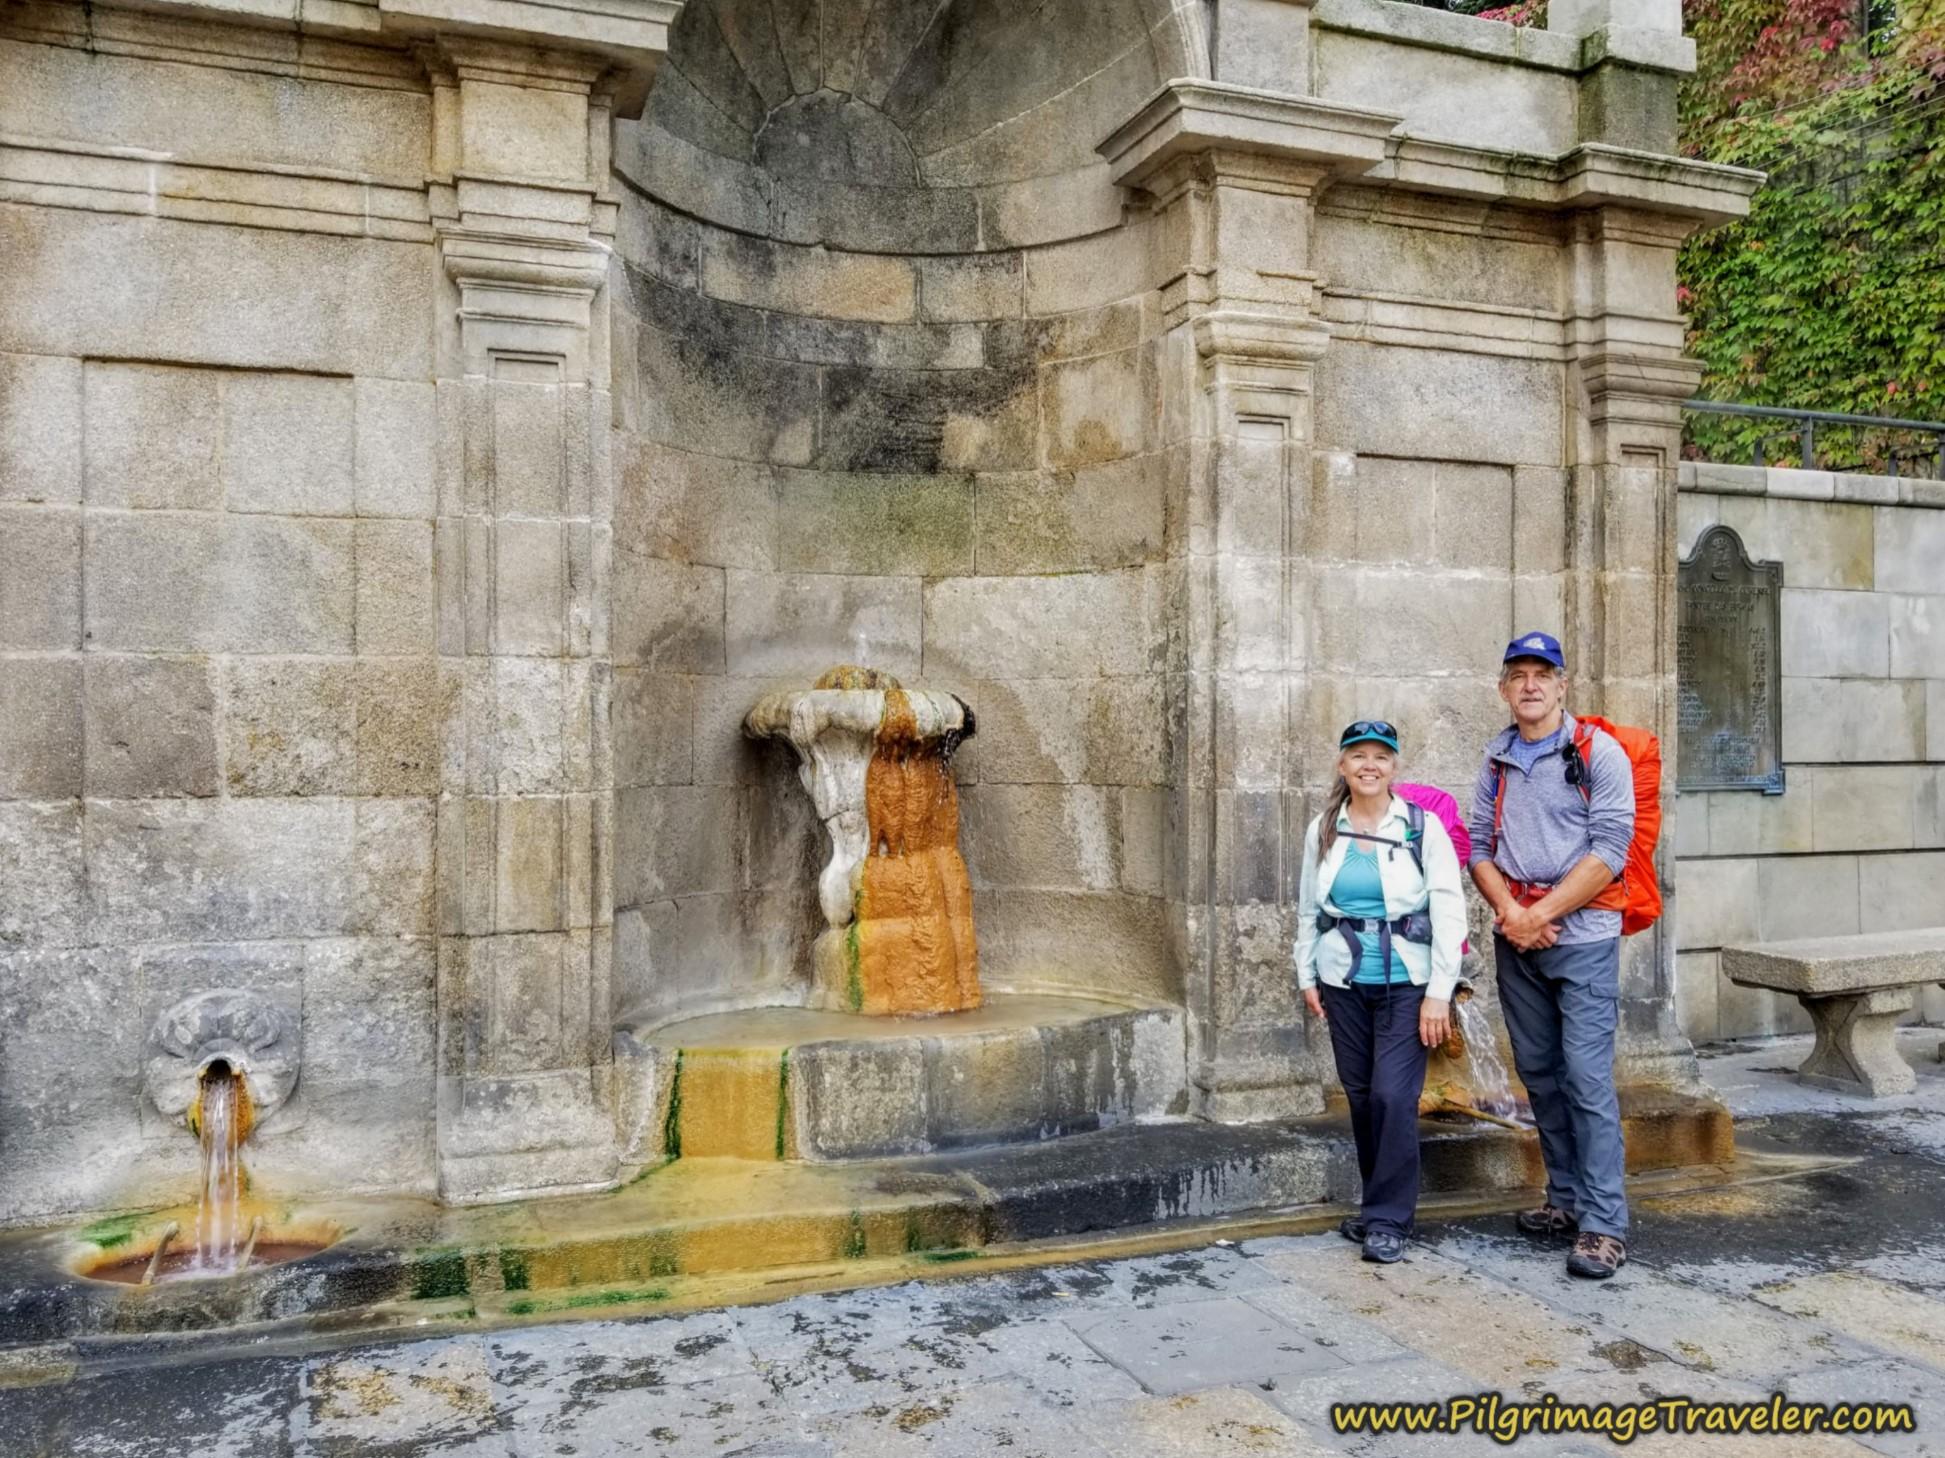 The As Burgas Fountain